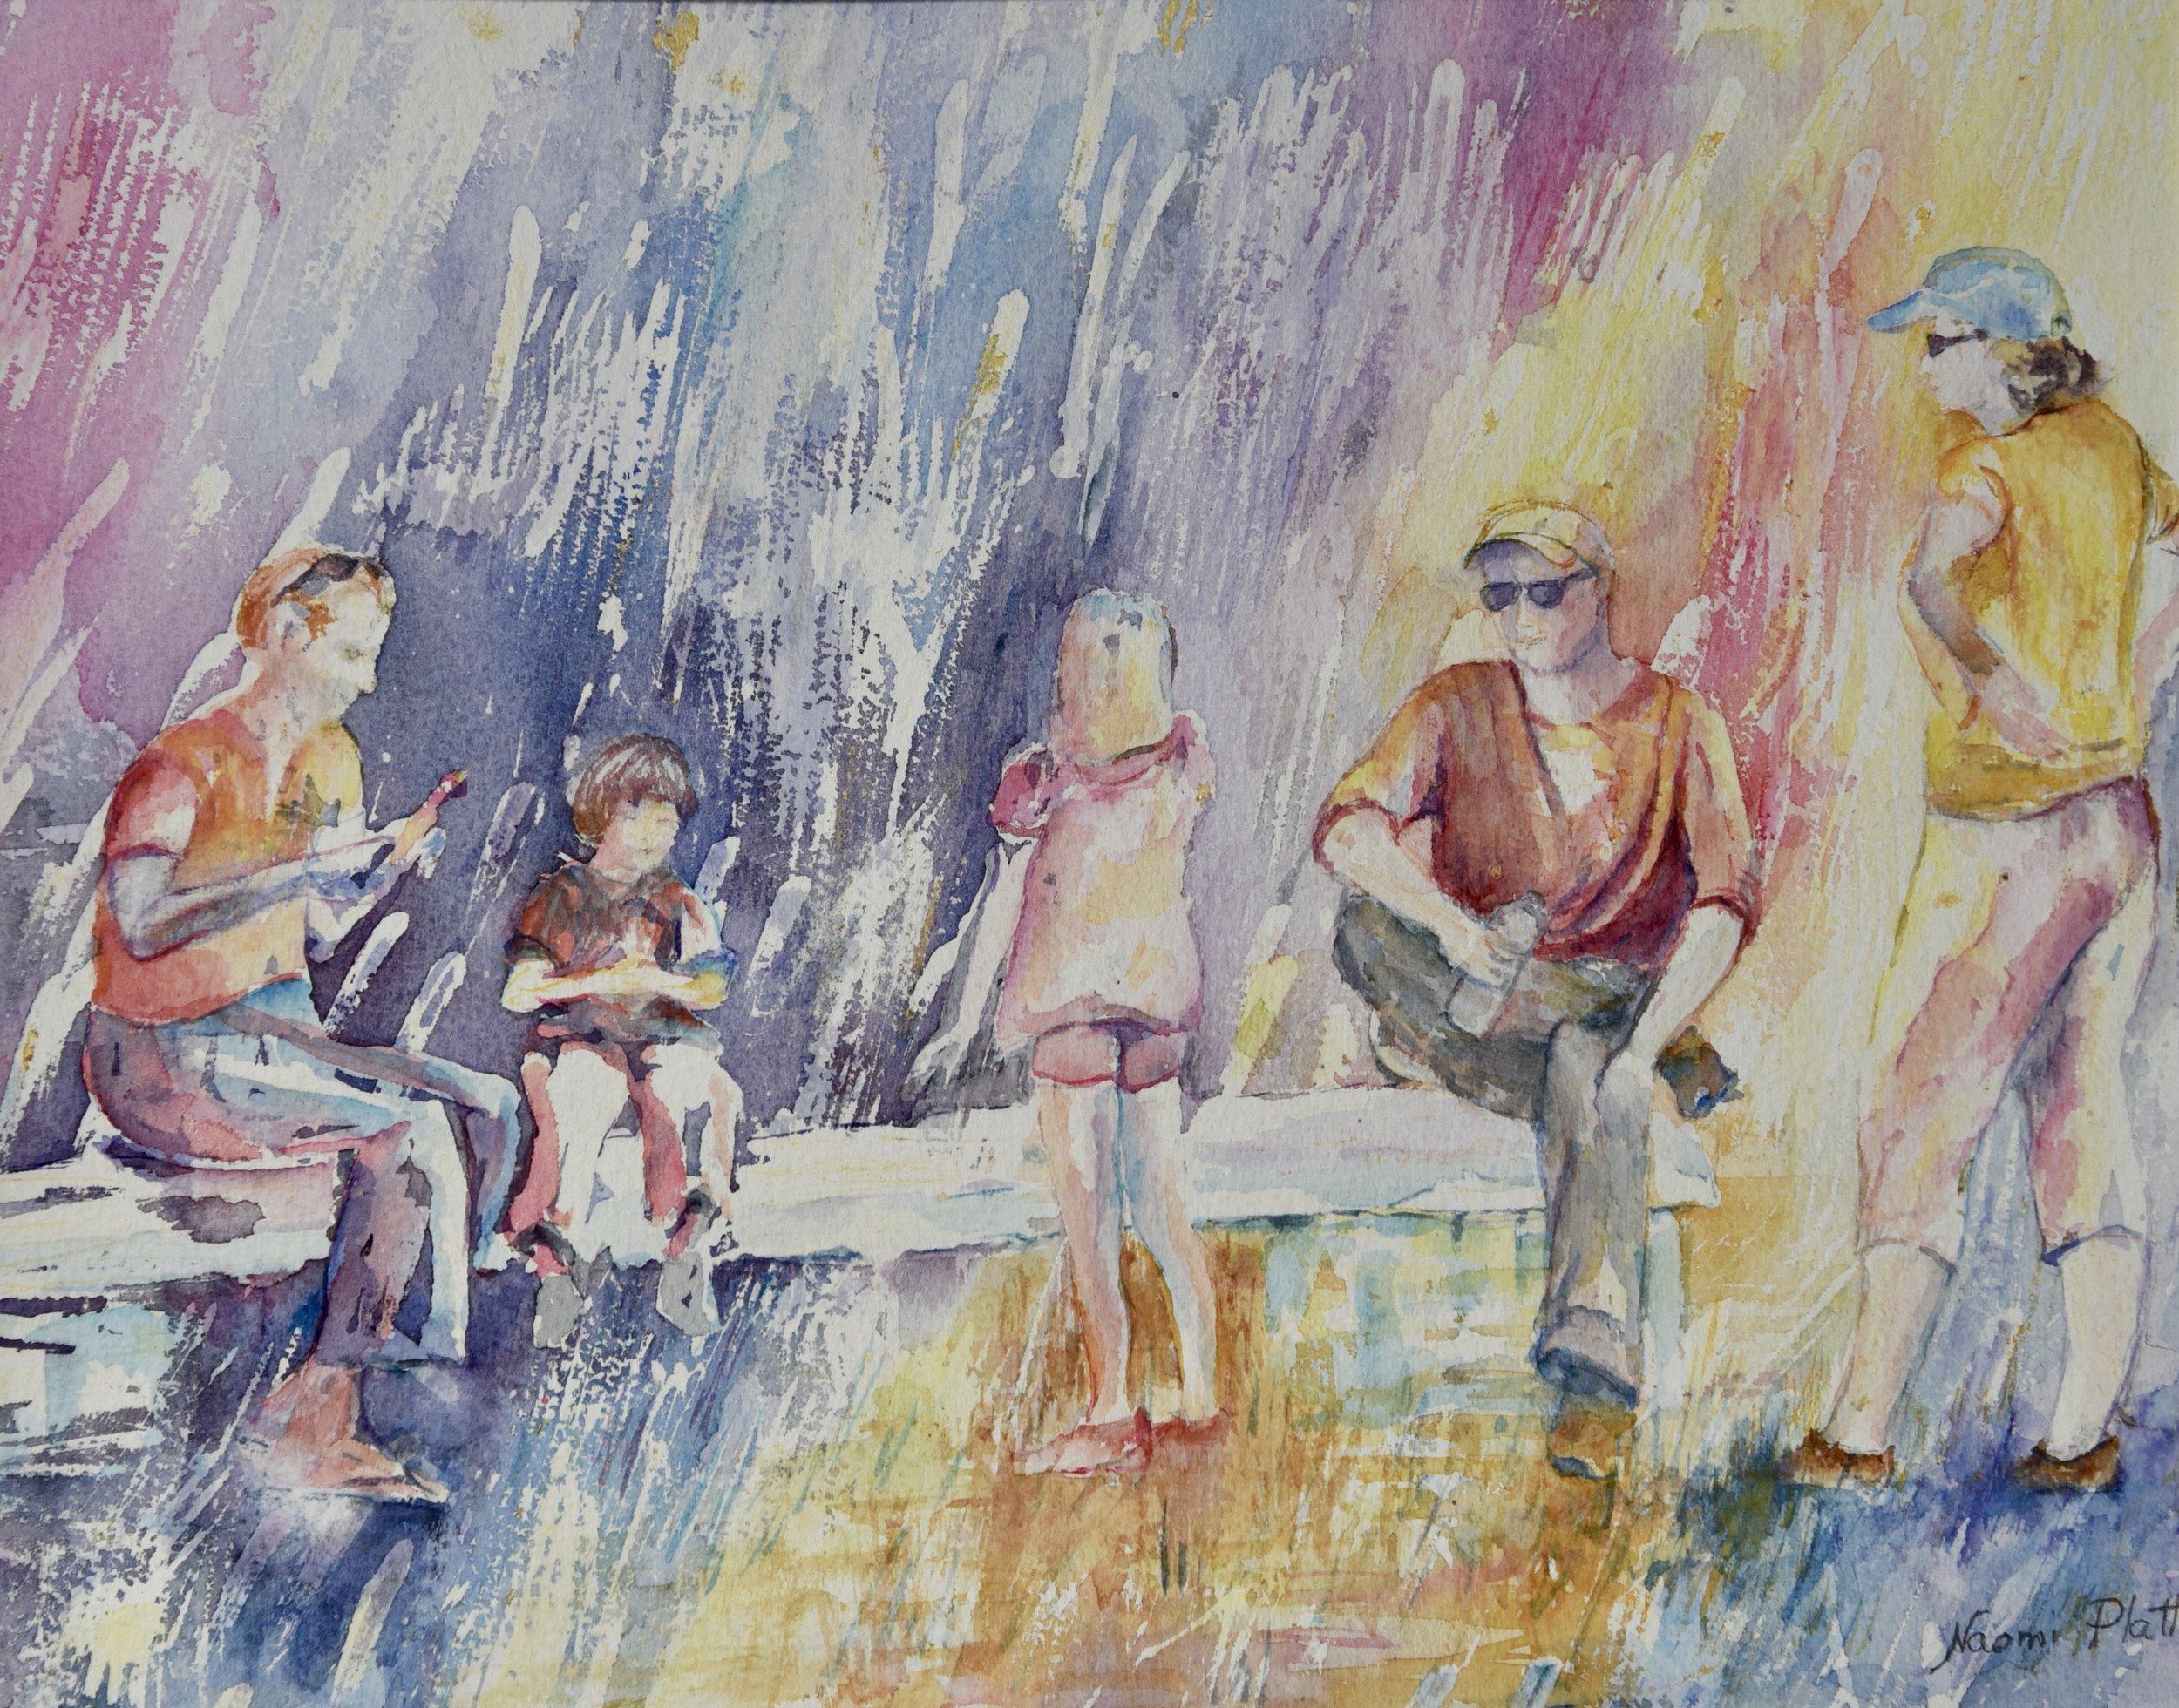 Family Picnic in the rainbow_11.5x14.5_150.jpg